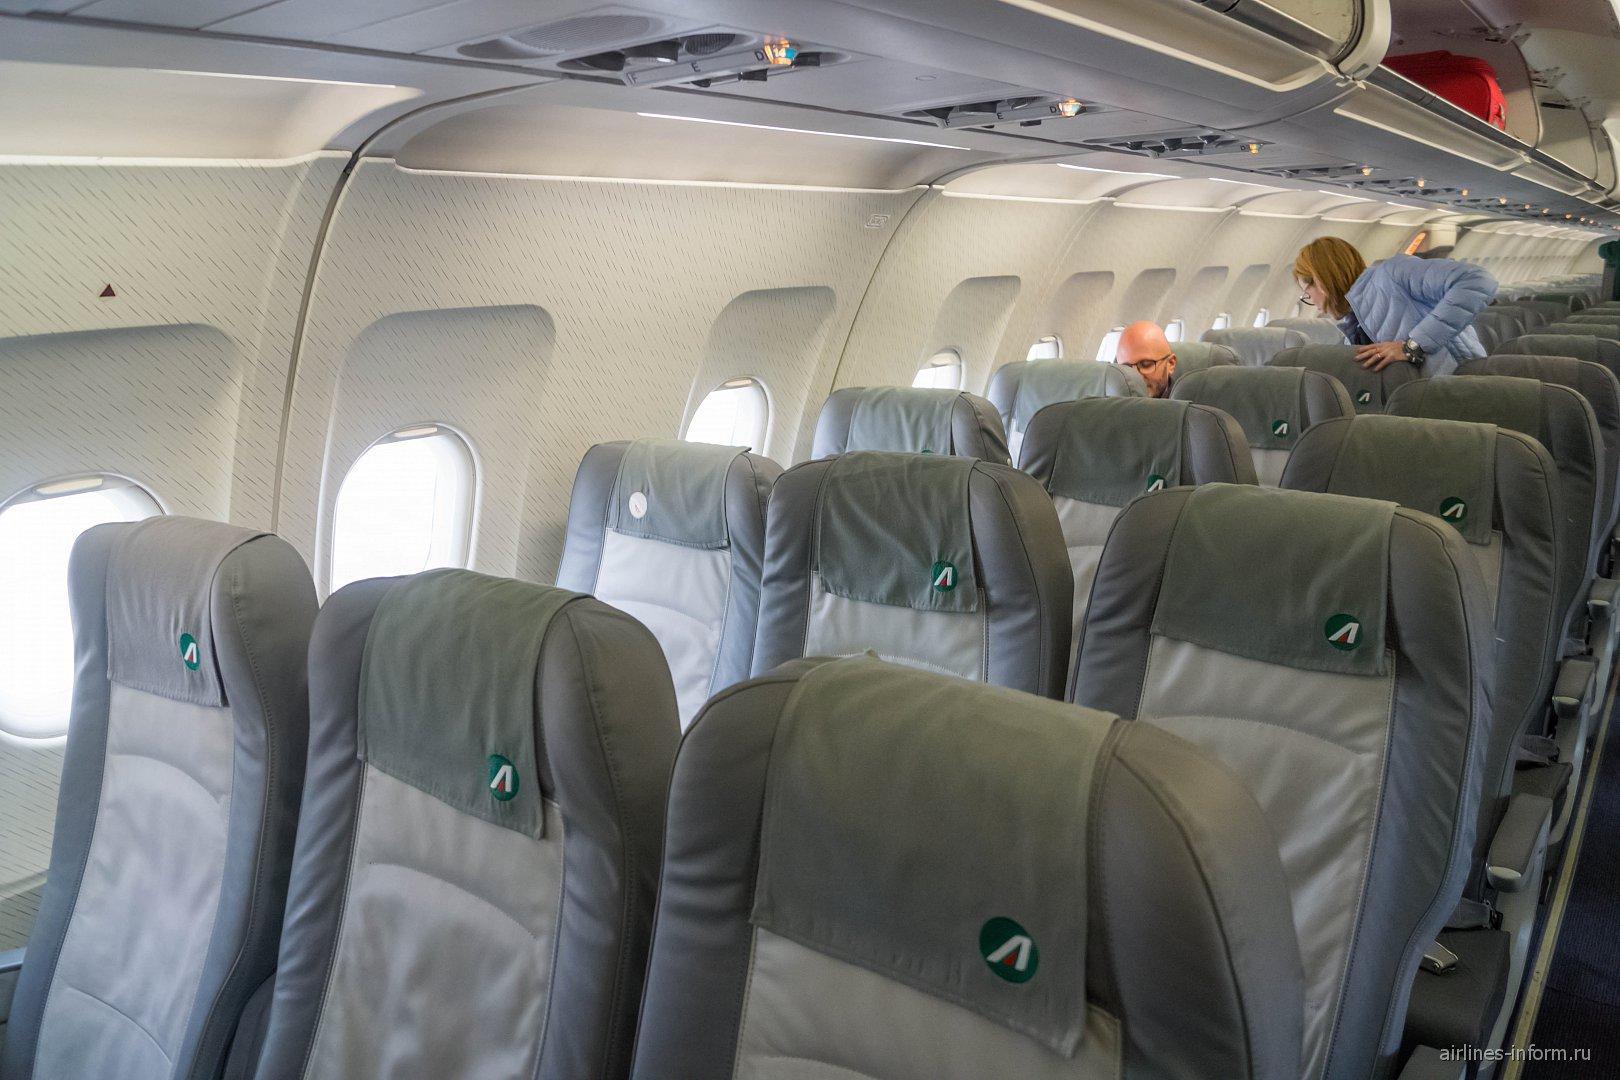 Салон самолета Airbus A321 авиакомпании Alitalia